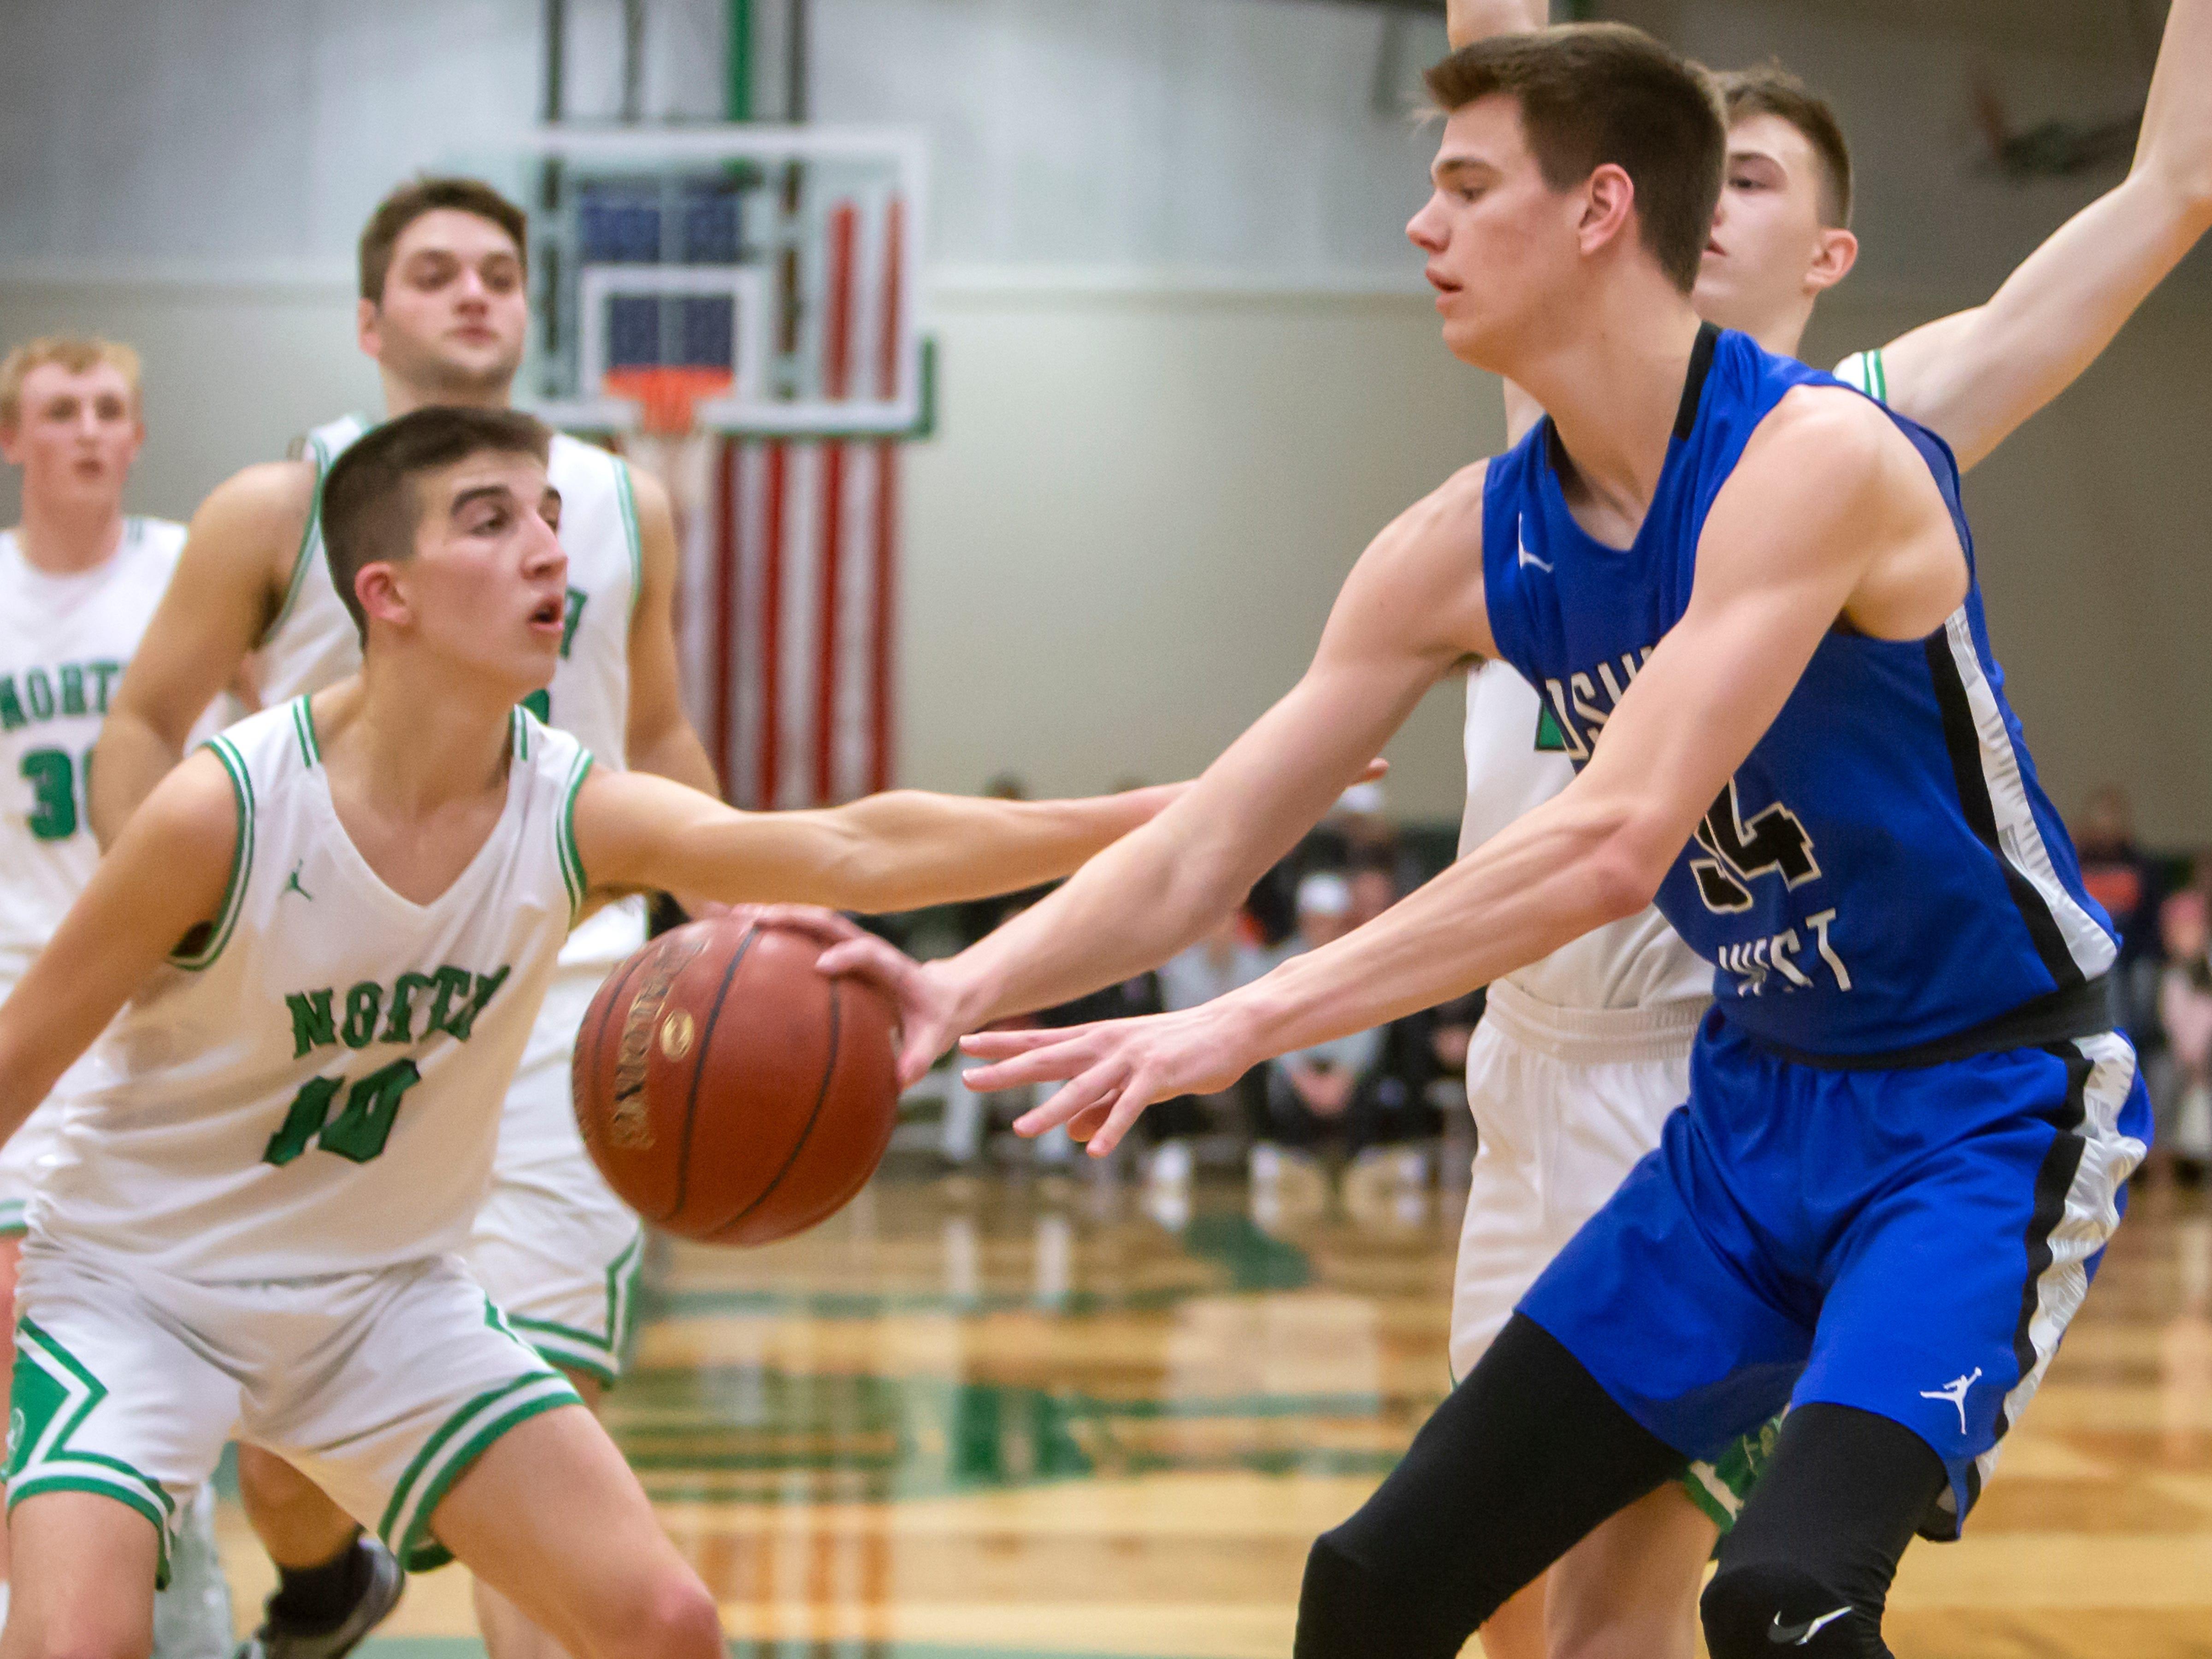 Oshkosh West's Luke Haasl passes the ball around Oshkosh North's Josh Dilling at the Oshkosh North High School on Tuesday, Jan. 8, 2019.